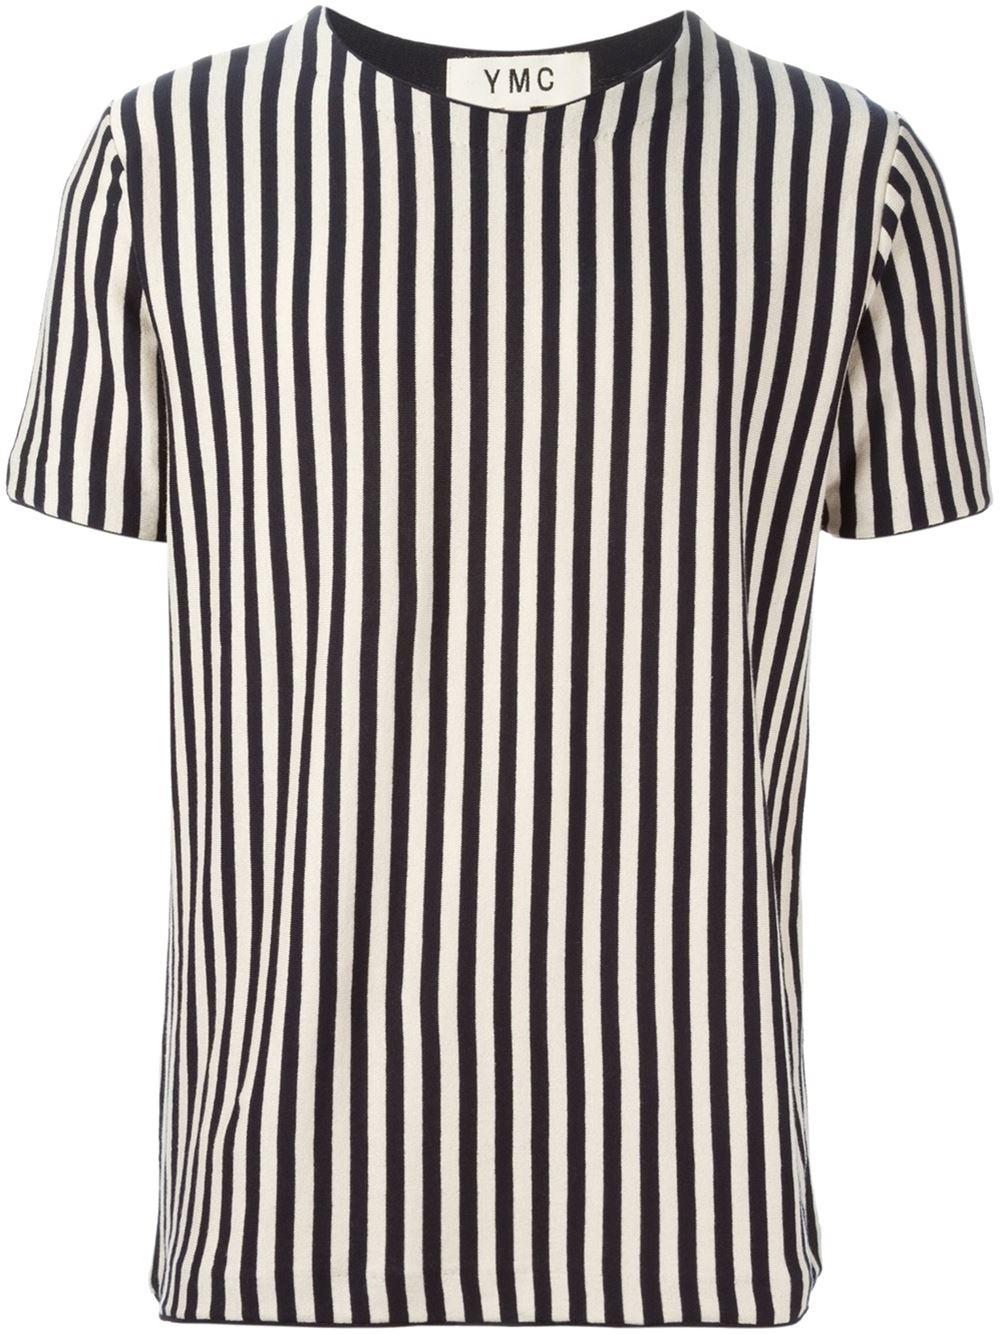 Lyst - Ymc Vertical Stripes T-Shirt in Blue for Men